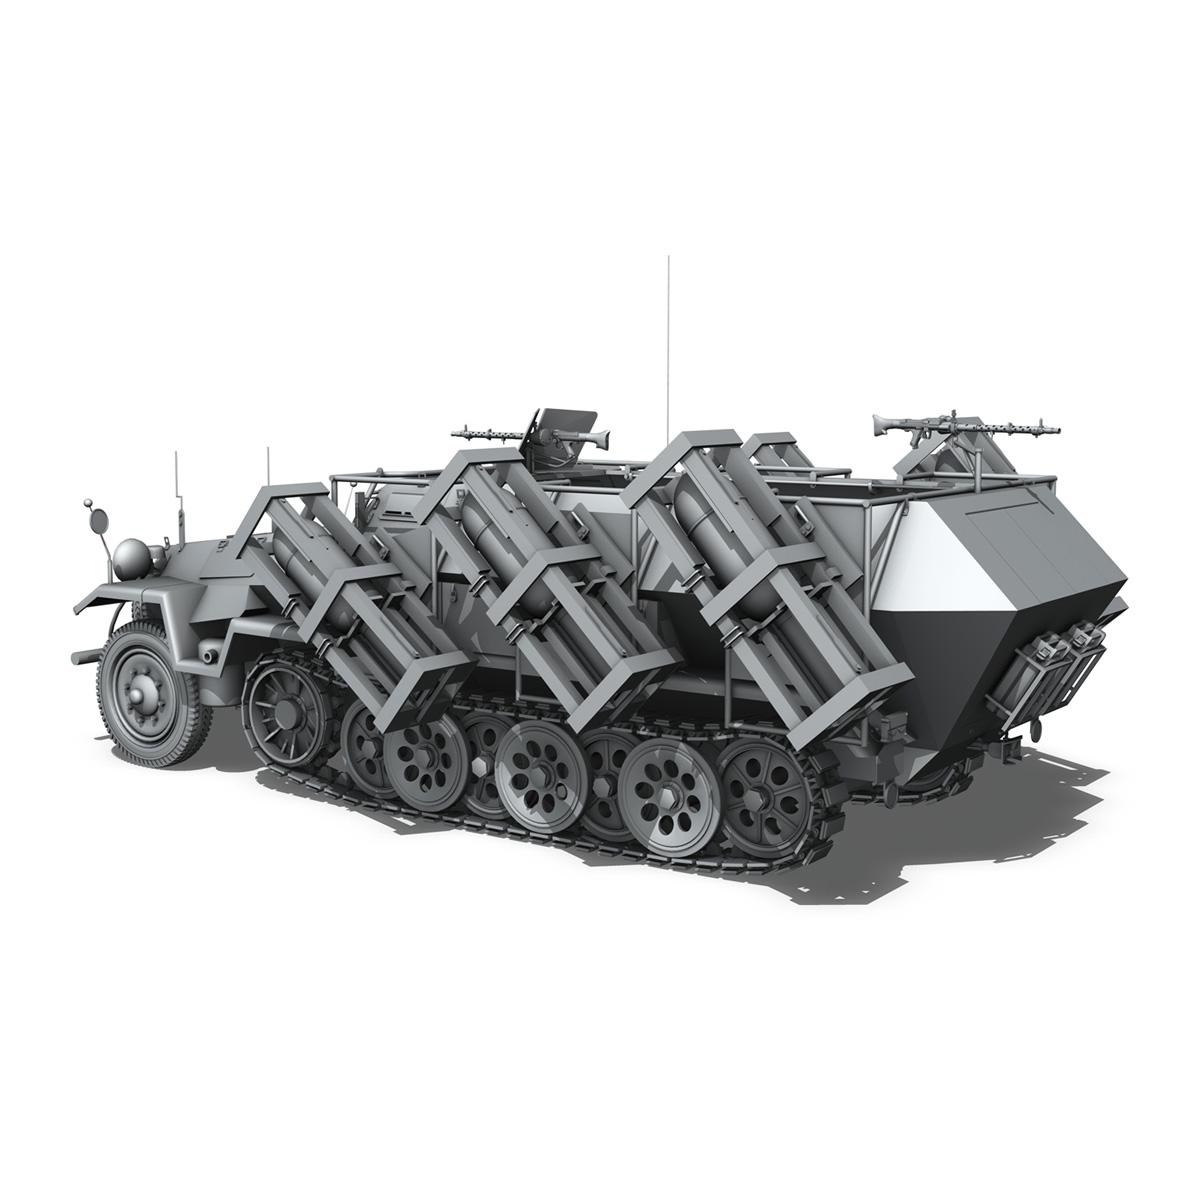 sdkfz 251 ausf.b – ground stuka 3d model 3ds fbx c4d lwo obj 251682